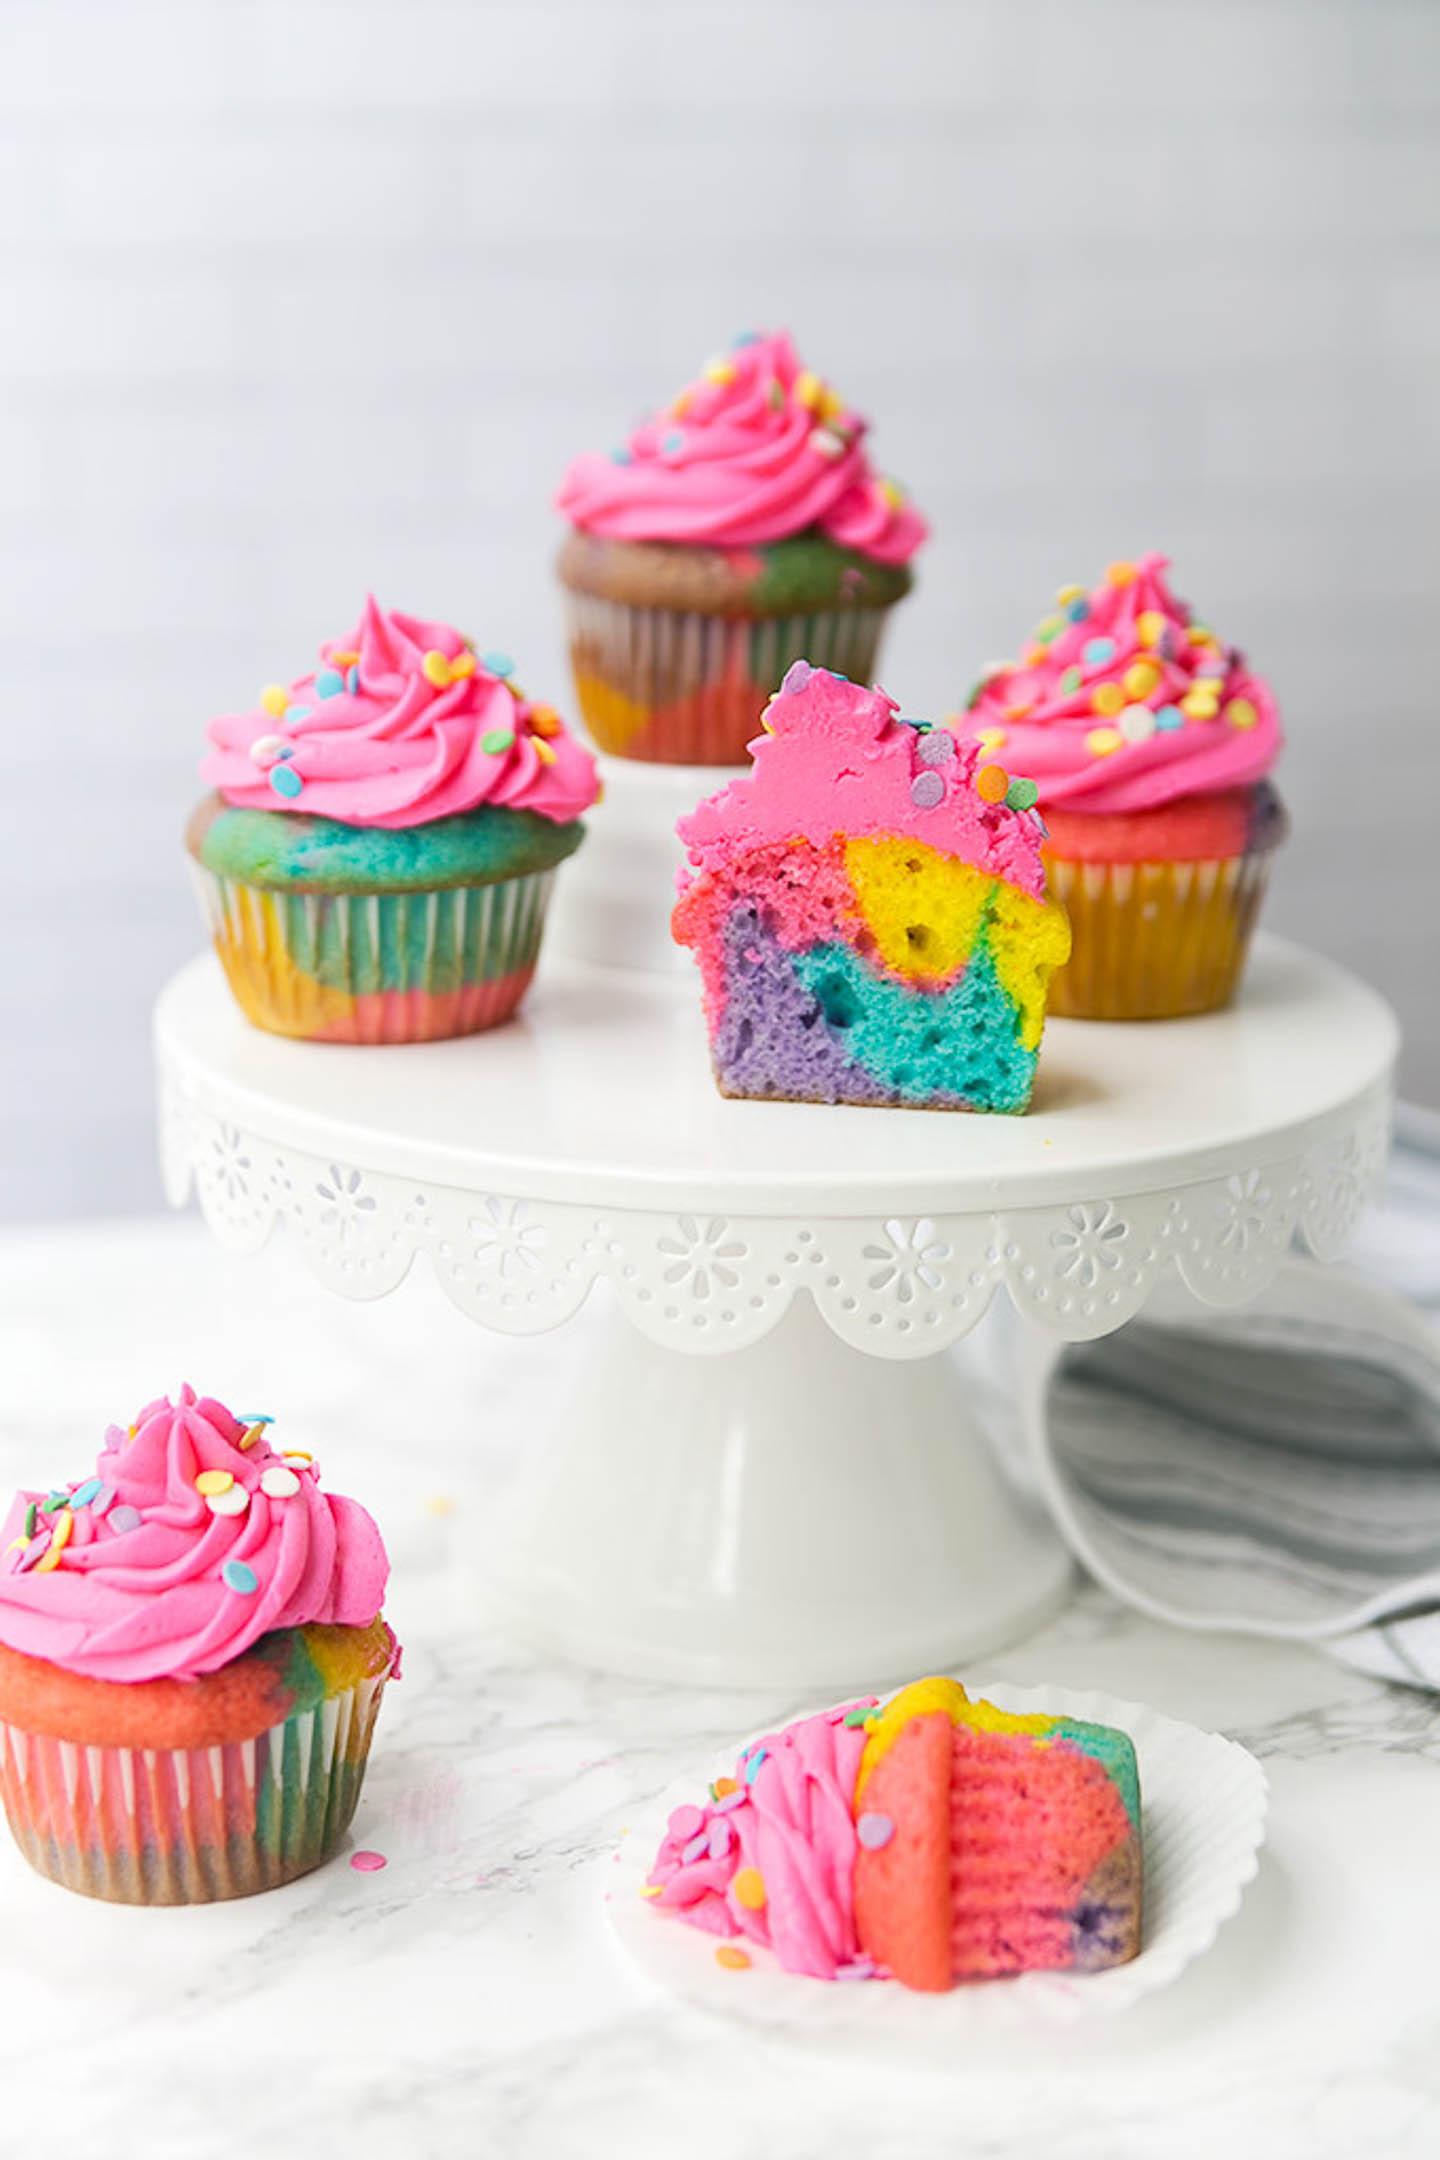 Rainbow marble cupcakes on a cakestand.